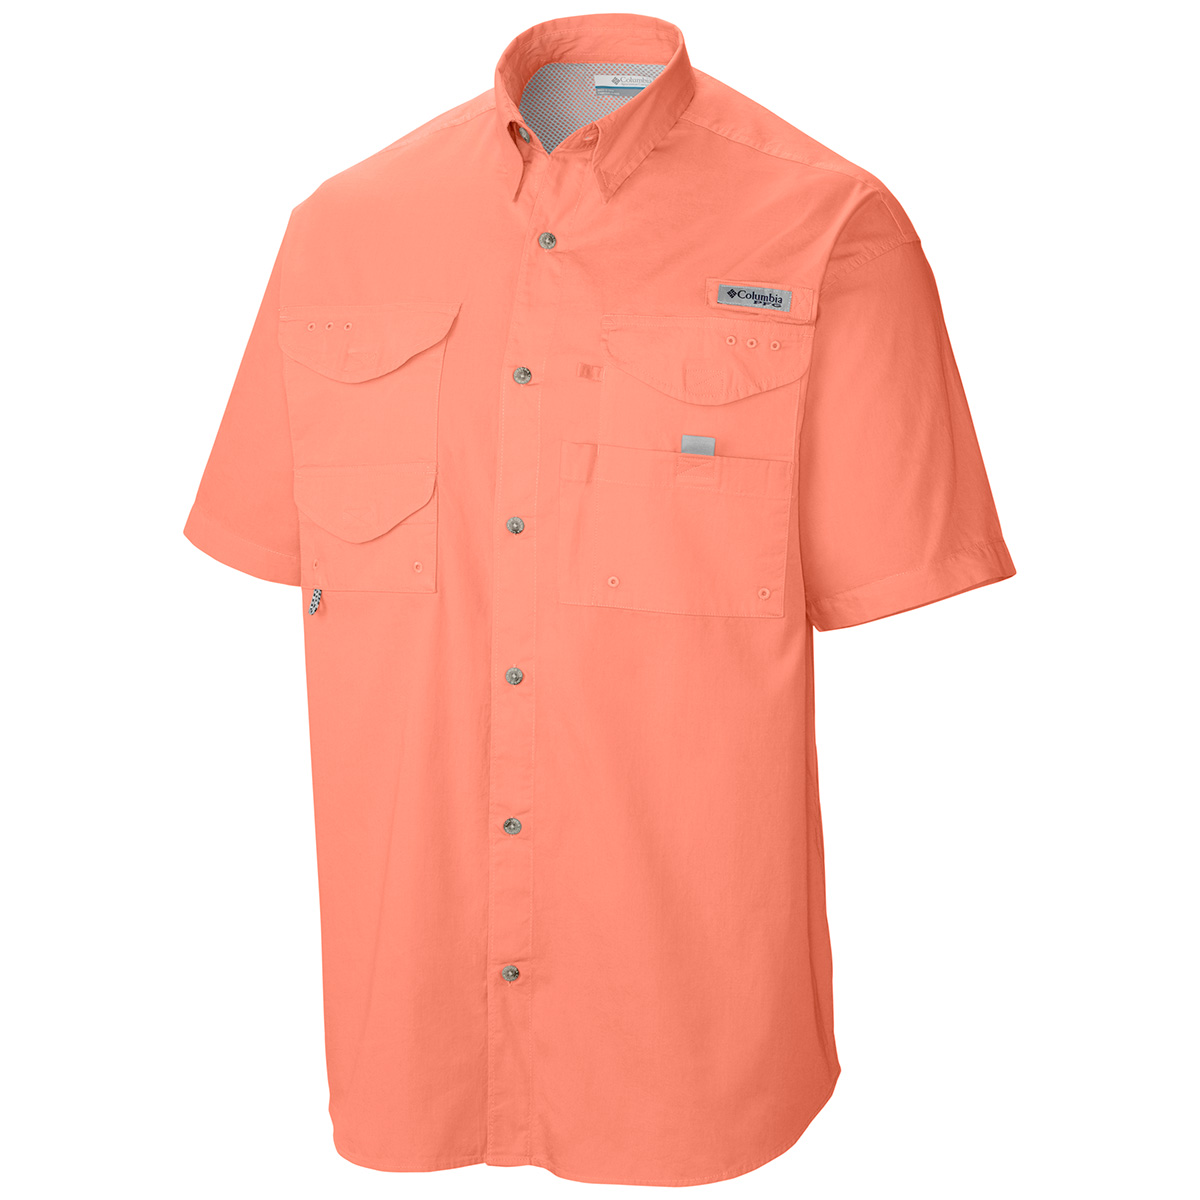 Columbia bonehead ss shirt fishing shirts taimen for Columbia bonehead fishing shirt